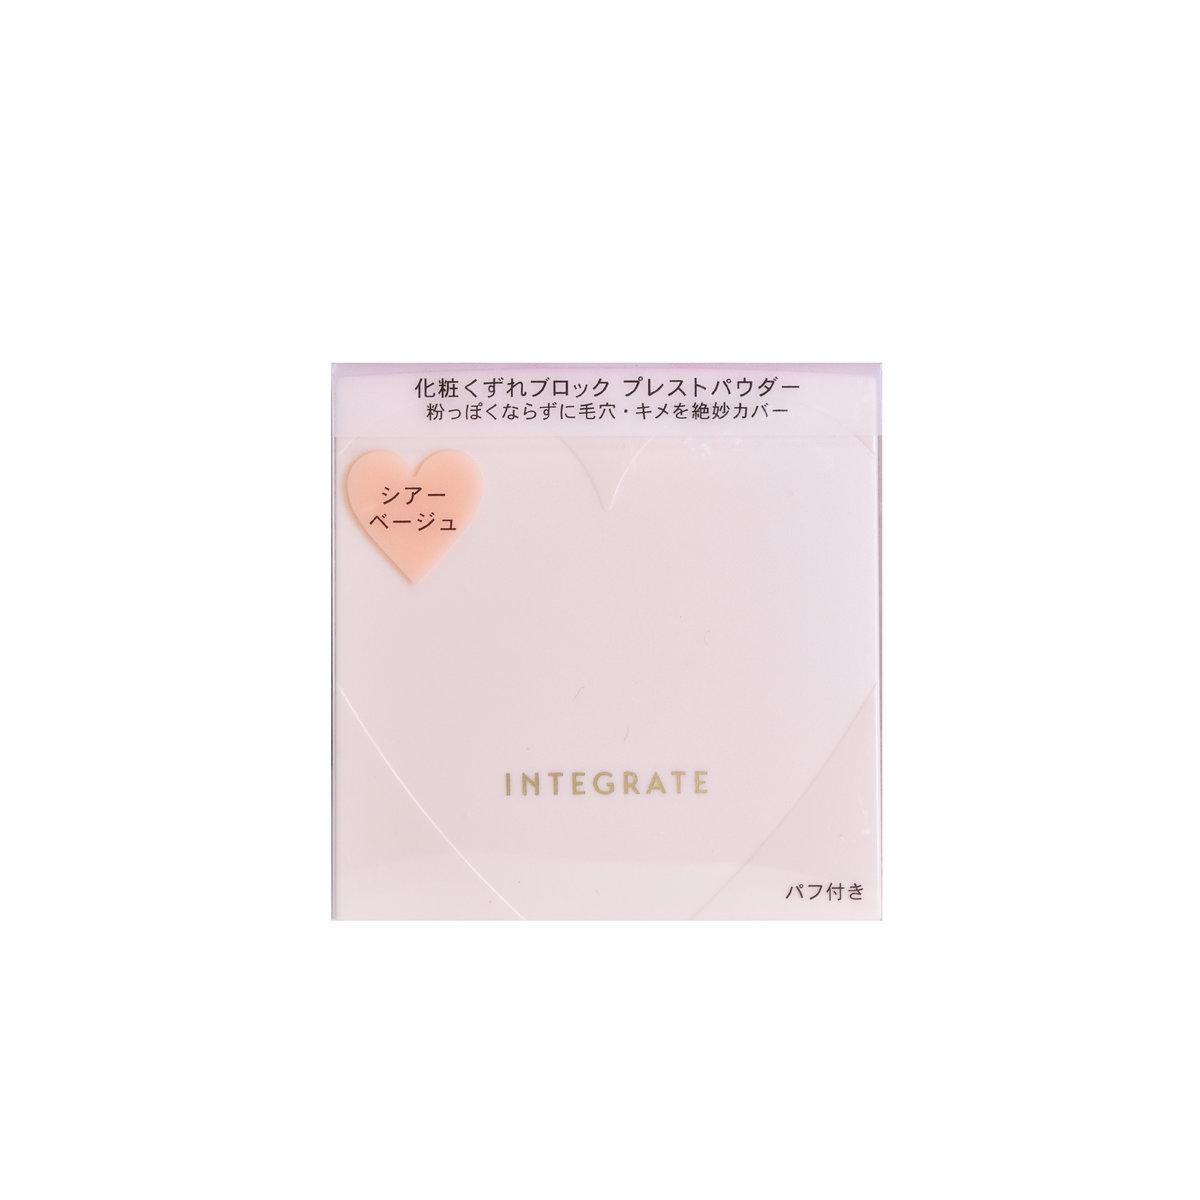 Integrate Super Keep Powder Makeup Base Face Powder 6.5g(4901872099641)